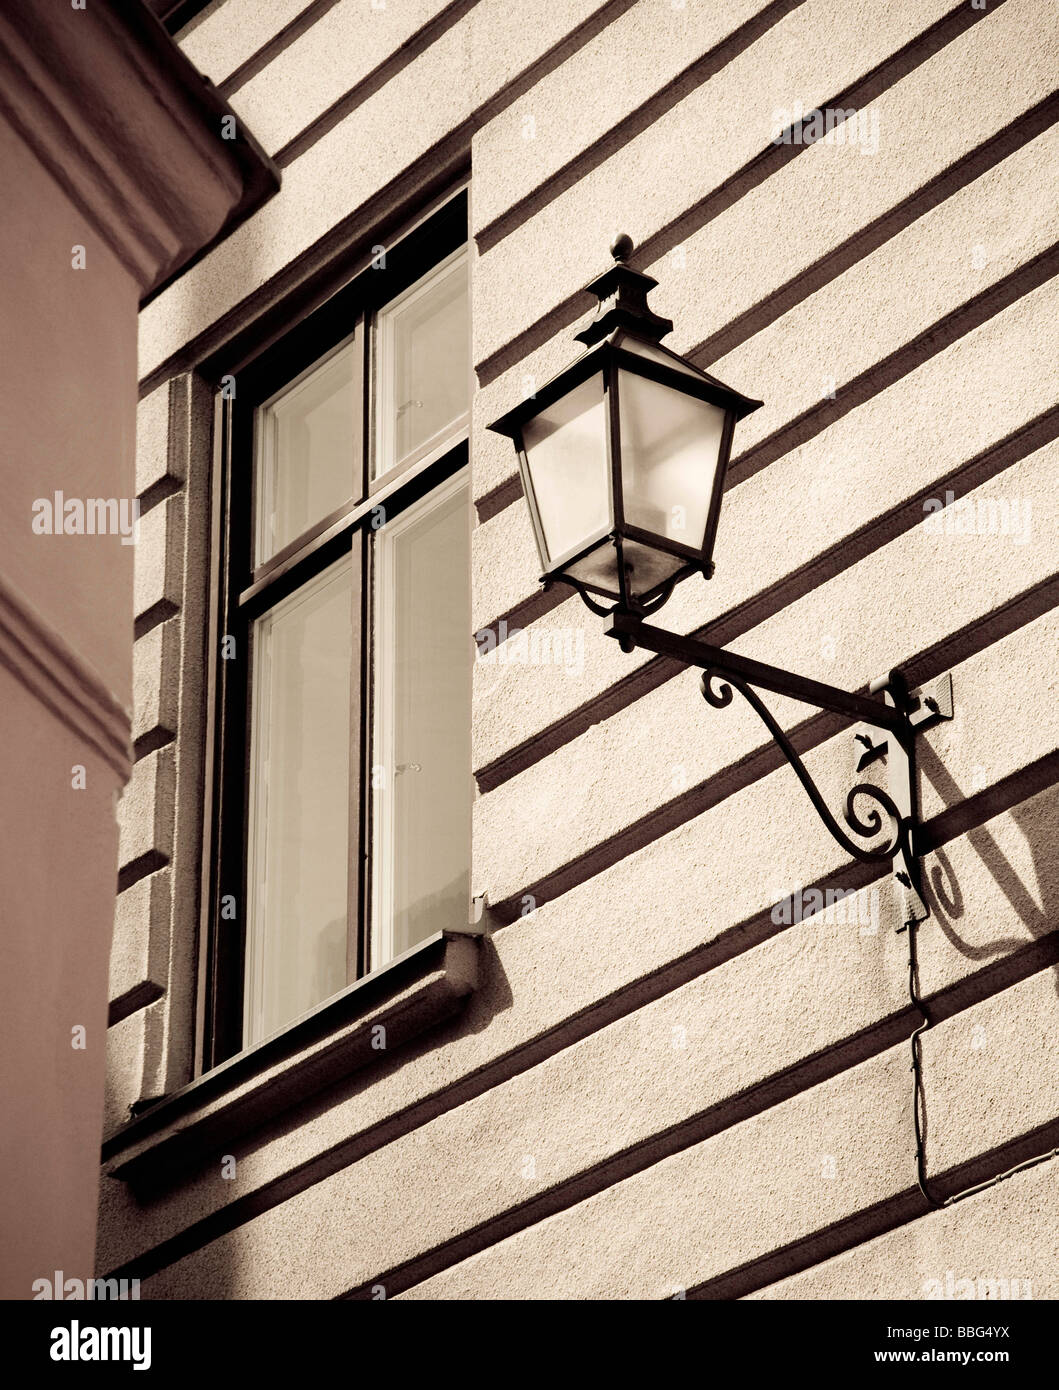 Swedish street lamp - Stock Image